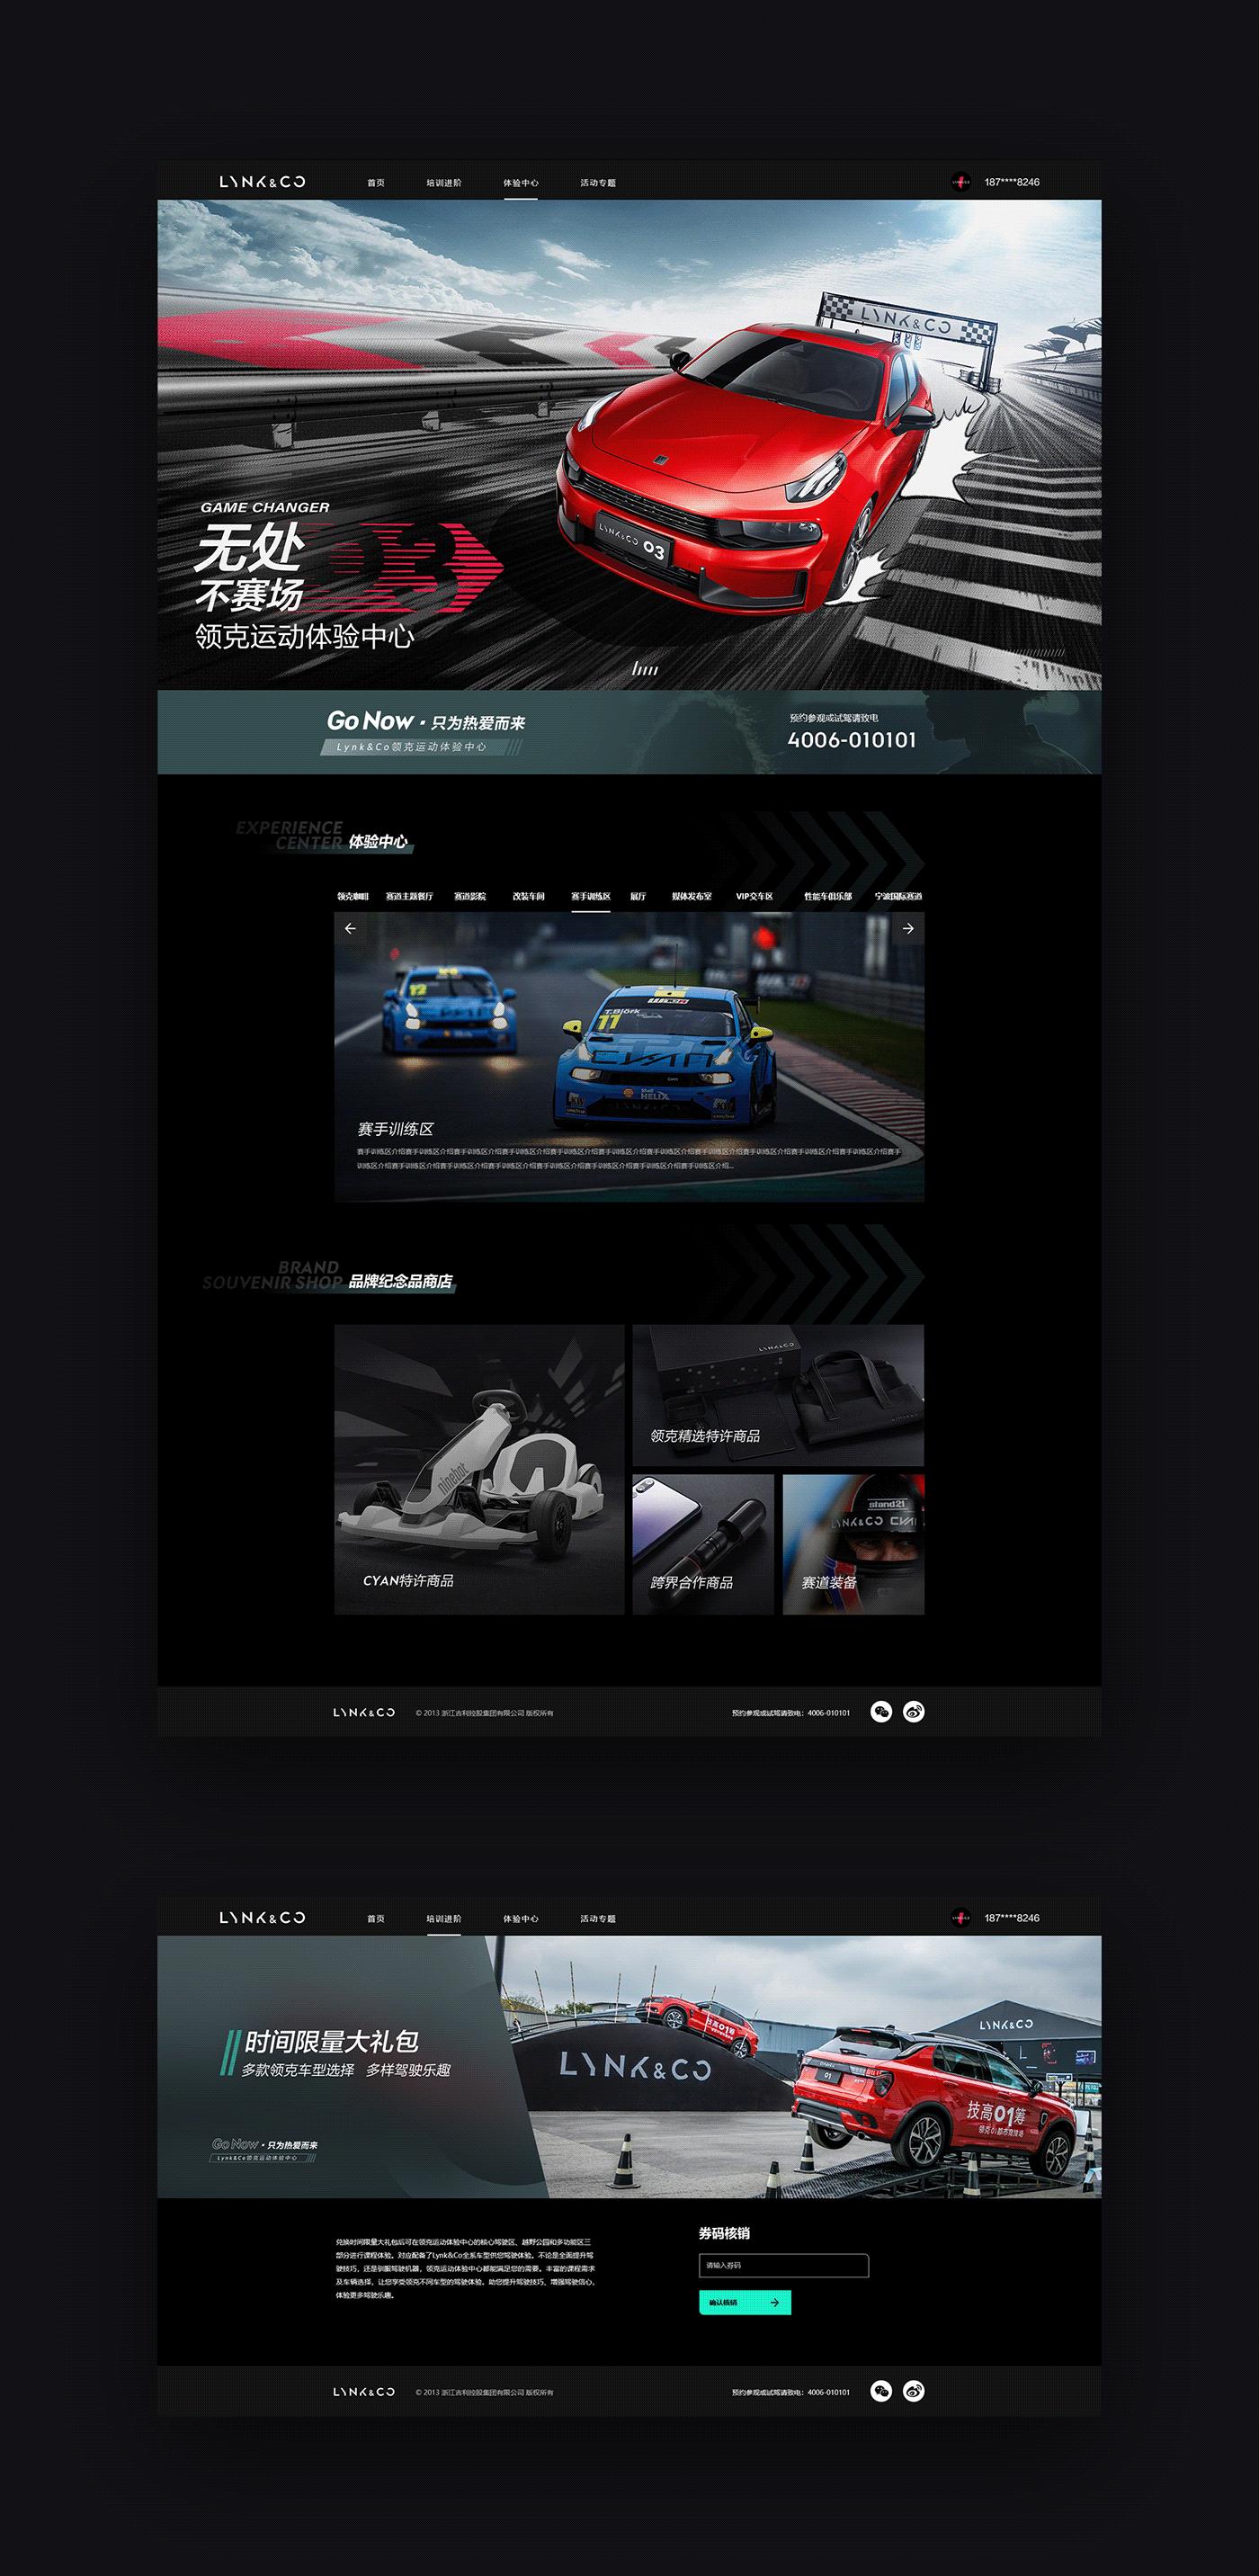 Image may contain: monitor, car and indoor